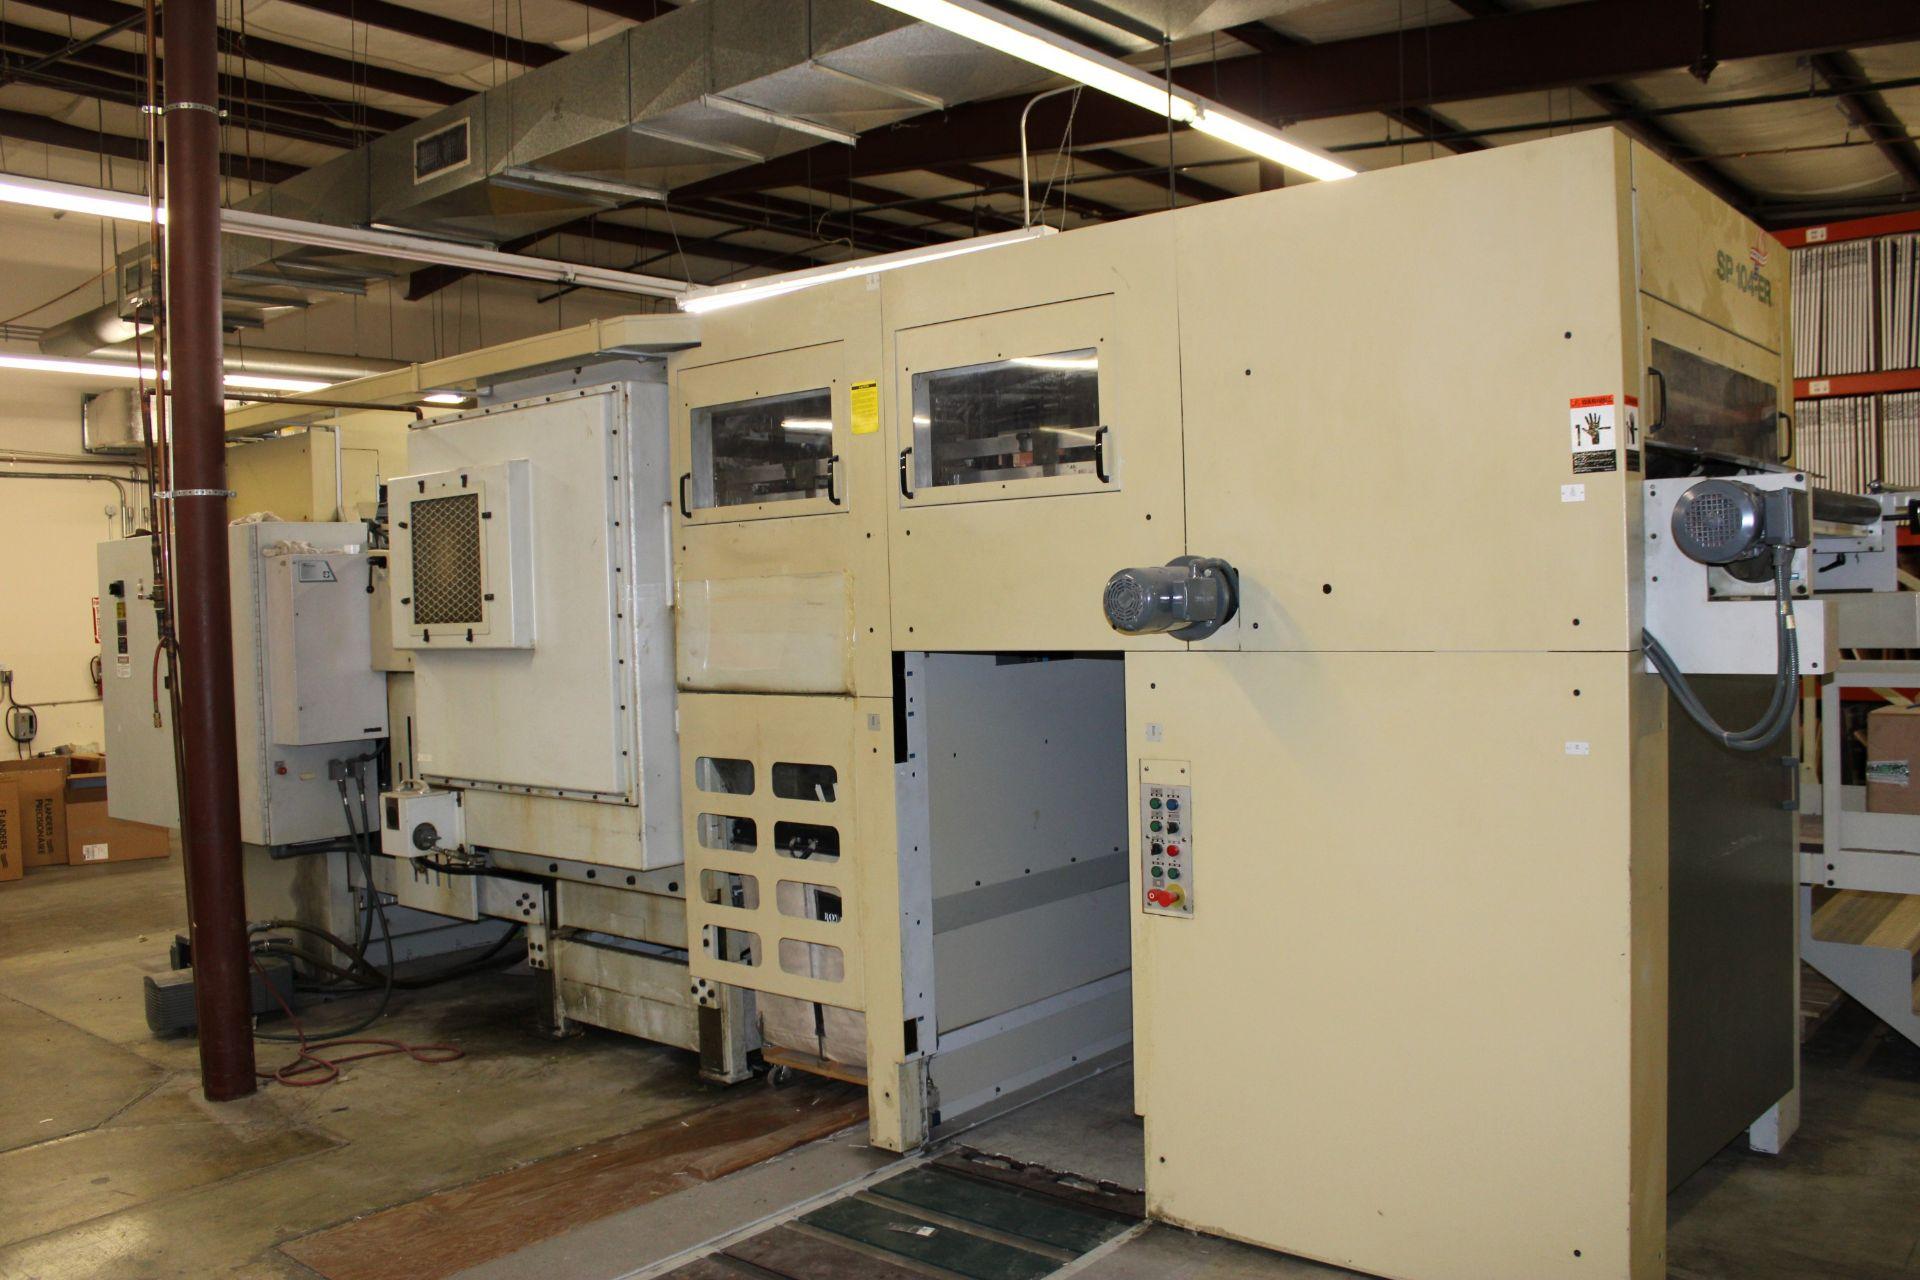 Lot 32 - 1999 BOBST SP104-ER Automatic Die Cutter/Blanker s/n 053104404